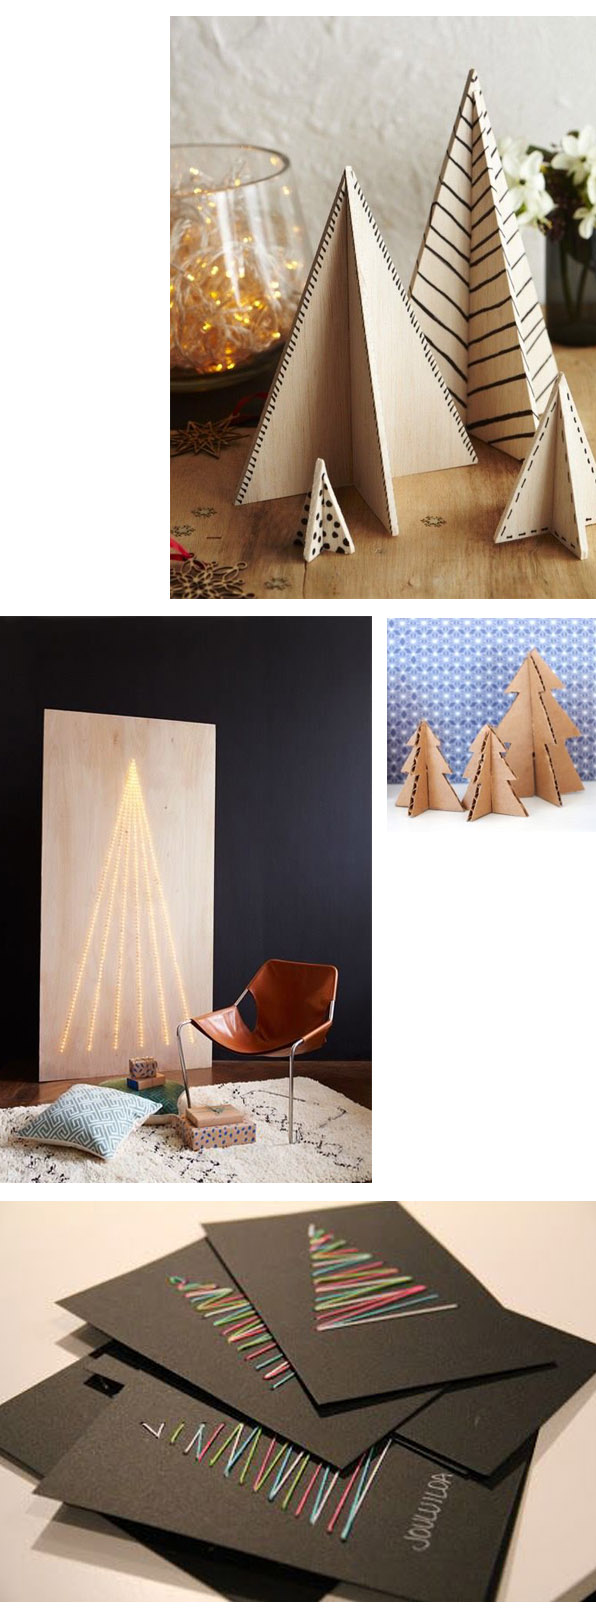 arboles navidad modus vivendi adornos navideños christmas tree diy handmade caseros